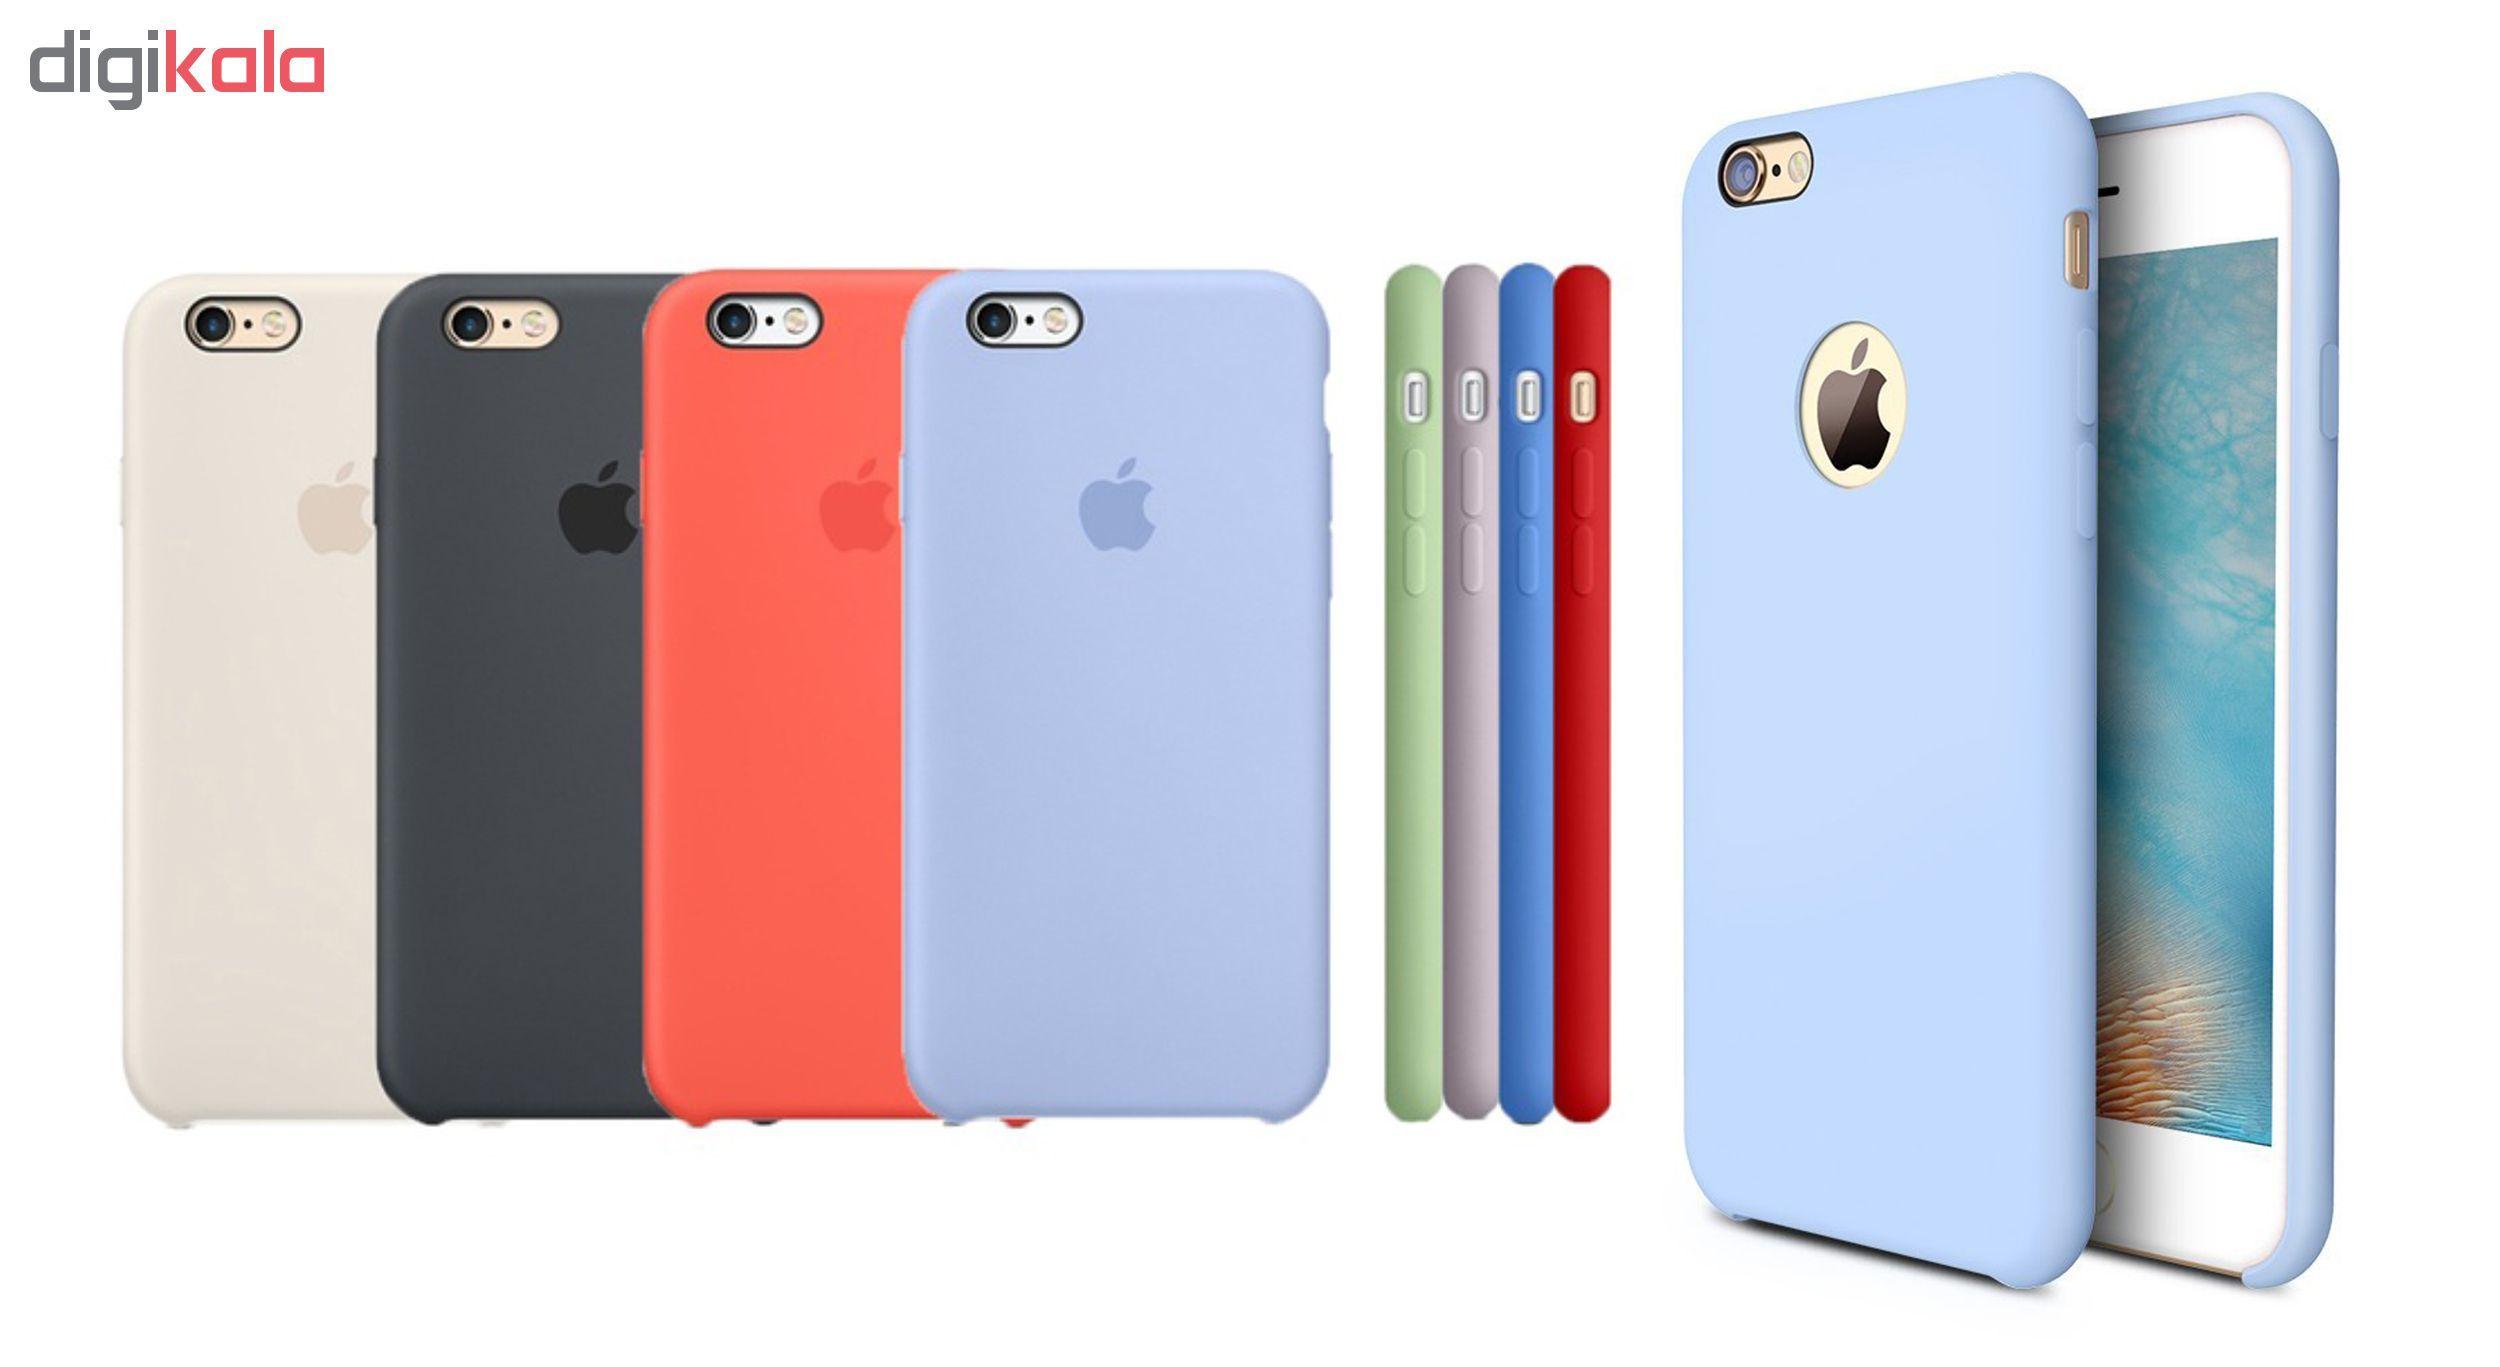 کاور سومگ مدل SIC مناسب برای گوشی موبایل اپل iPhone 6/6s main 1 7